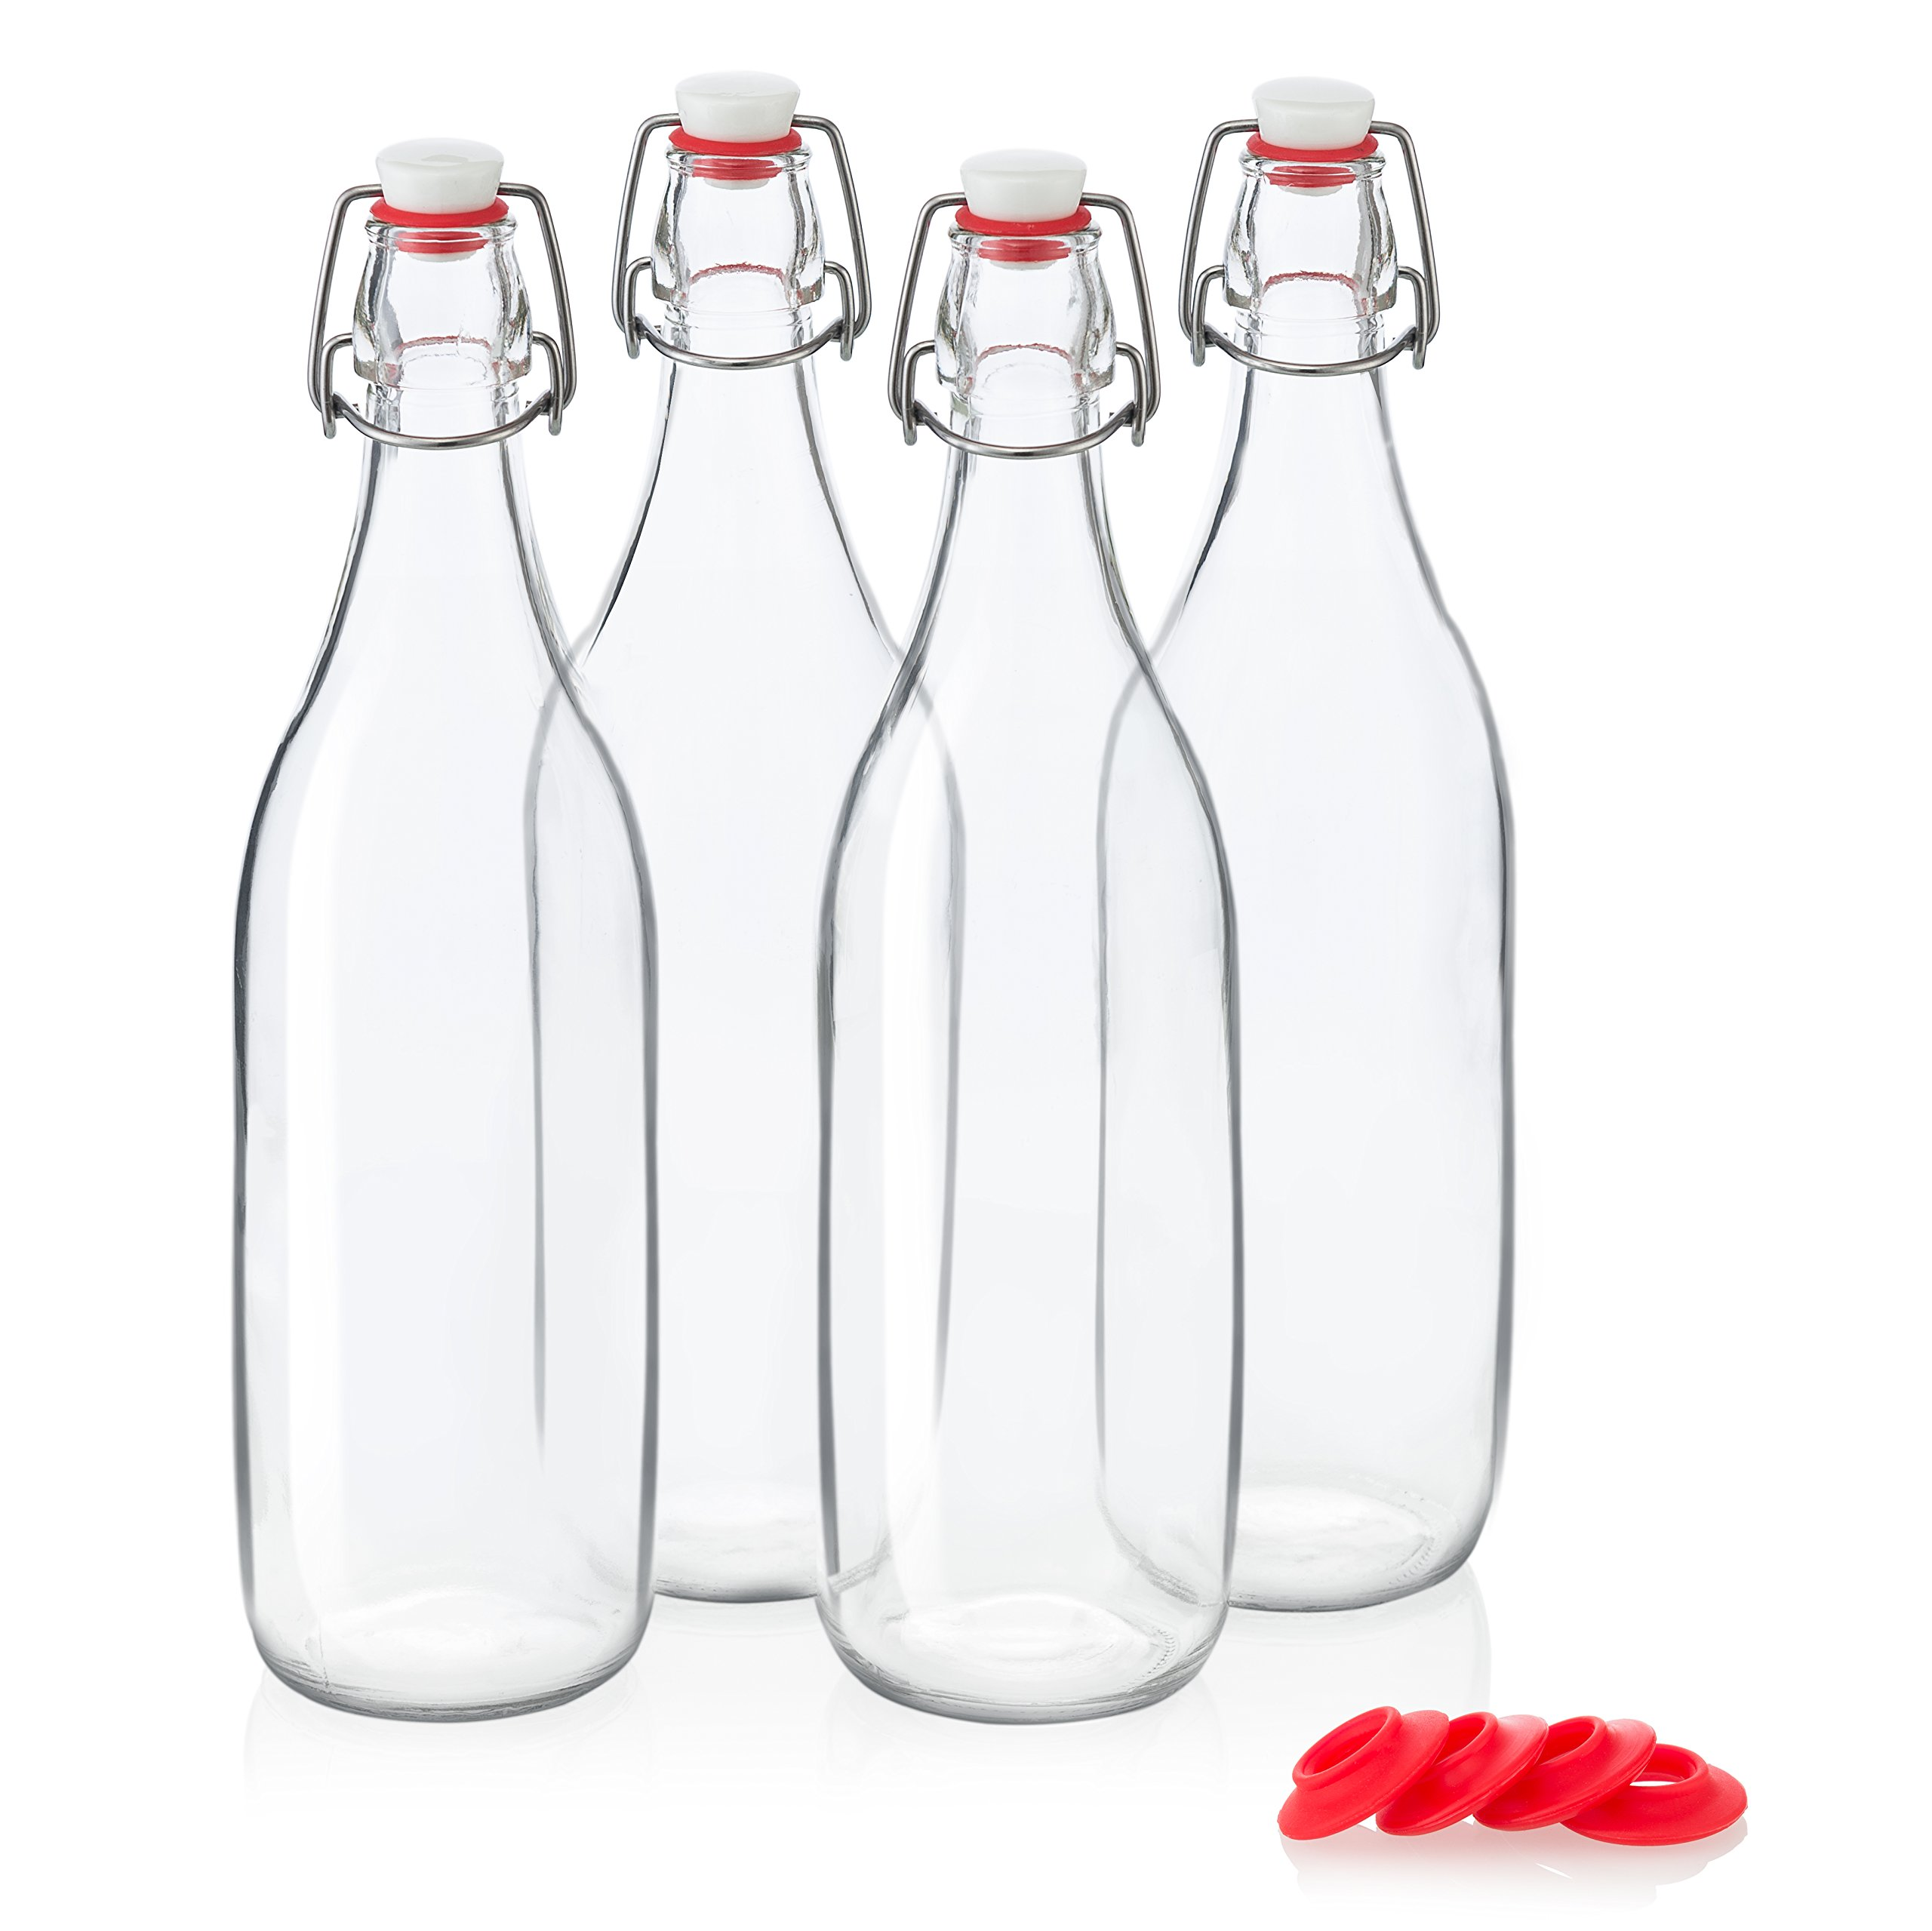 Swing Top Glass Bottles 32oz / 1 Litre - CERAMIC TOPS - Giara Glass Bottles With Stopper Caps - Flip Top Water Bottles - Clear [4pk Set]